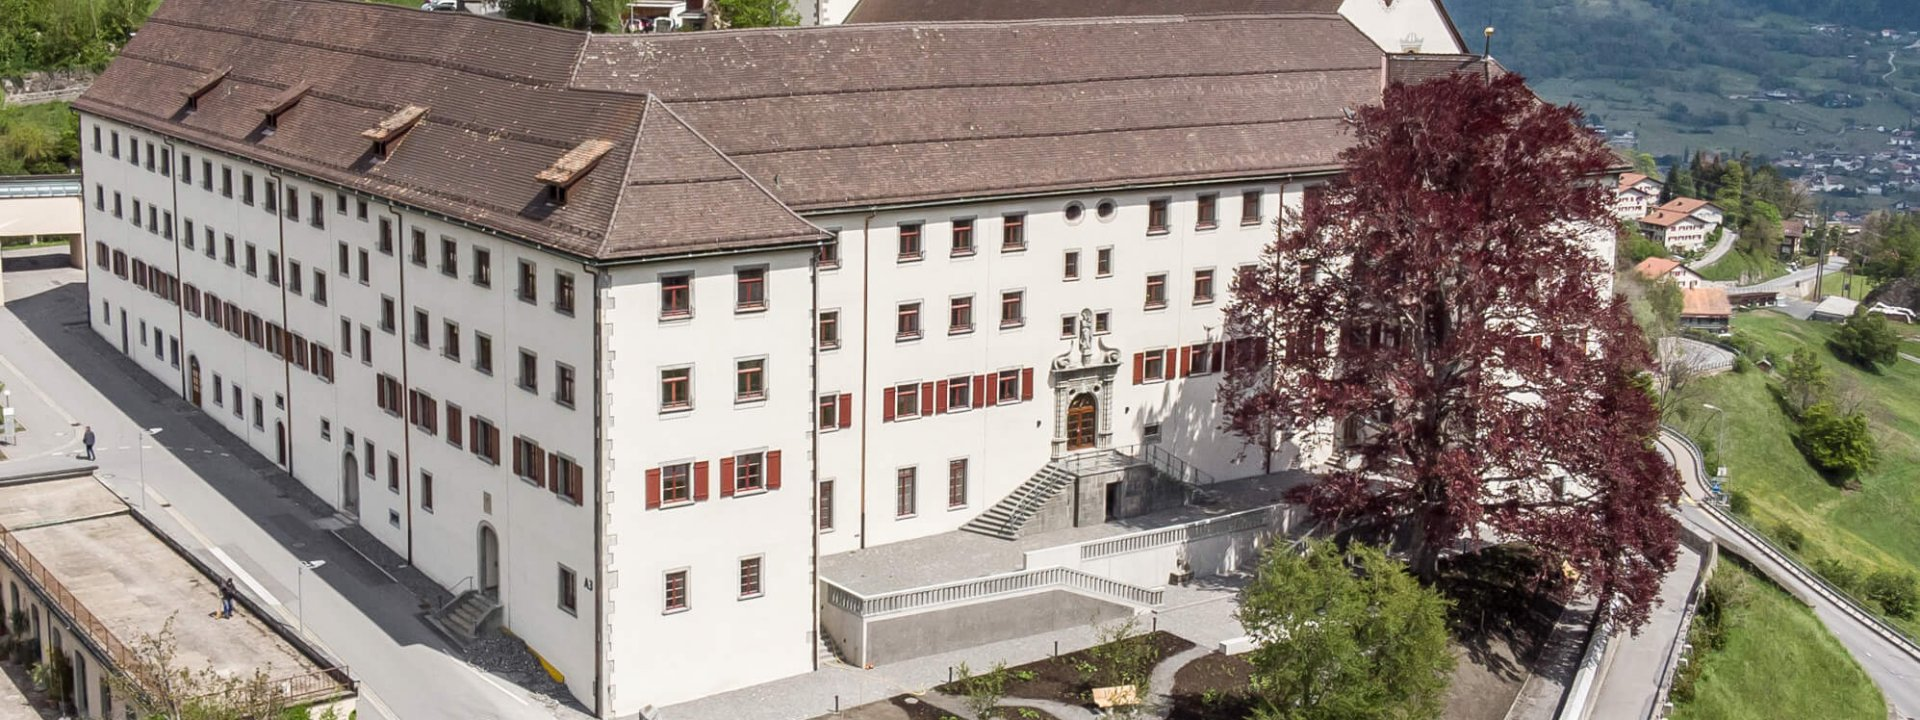 24 25 Bild 1 Klinik Pfaefers Foto Hanspeter SchiessSG